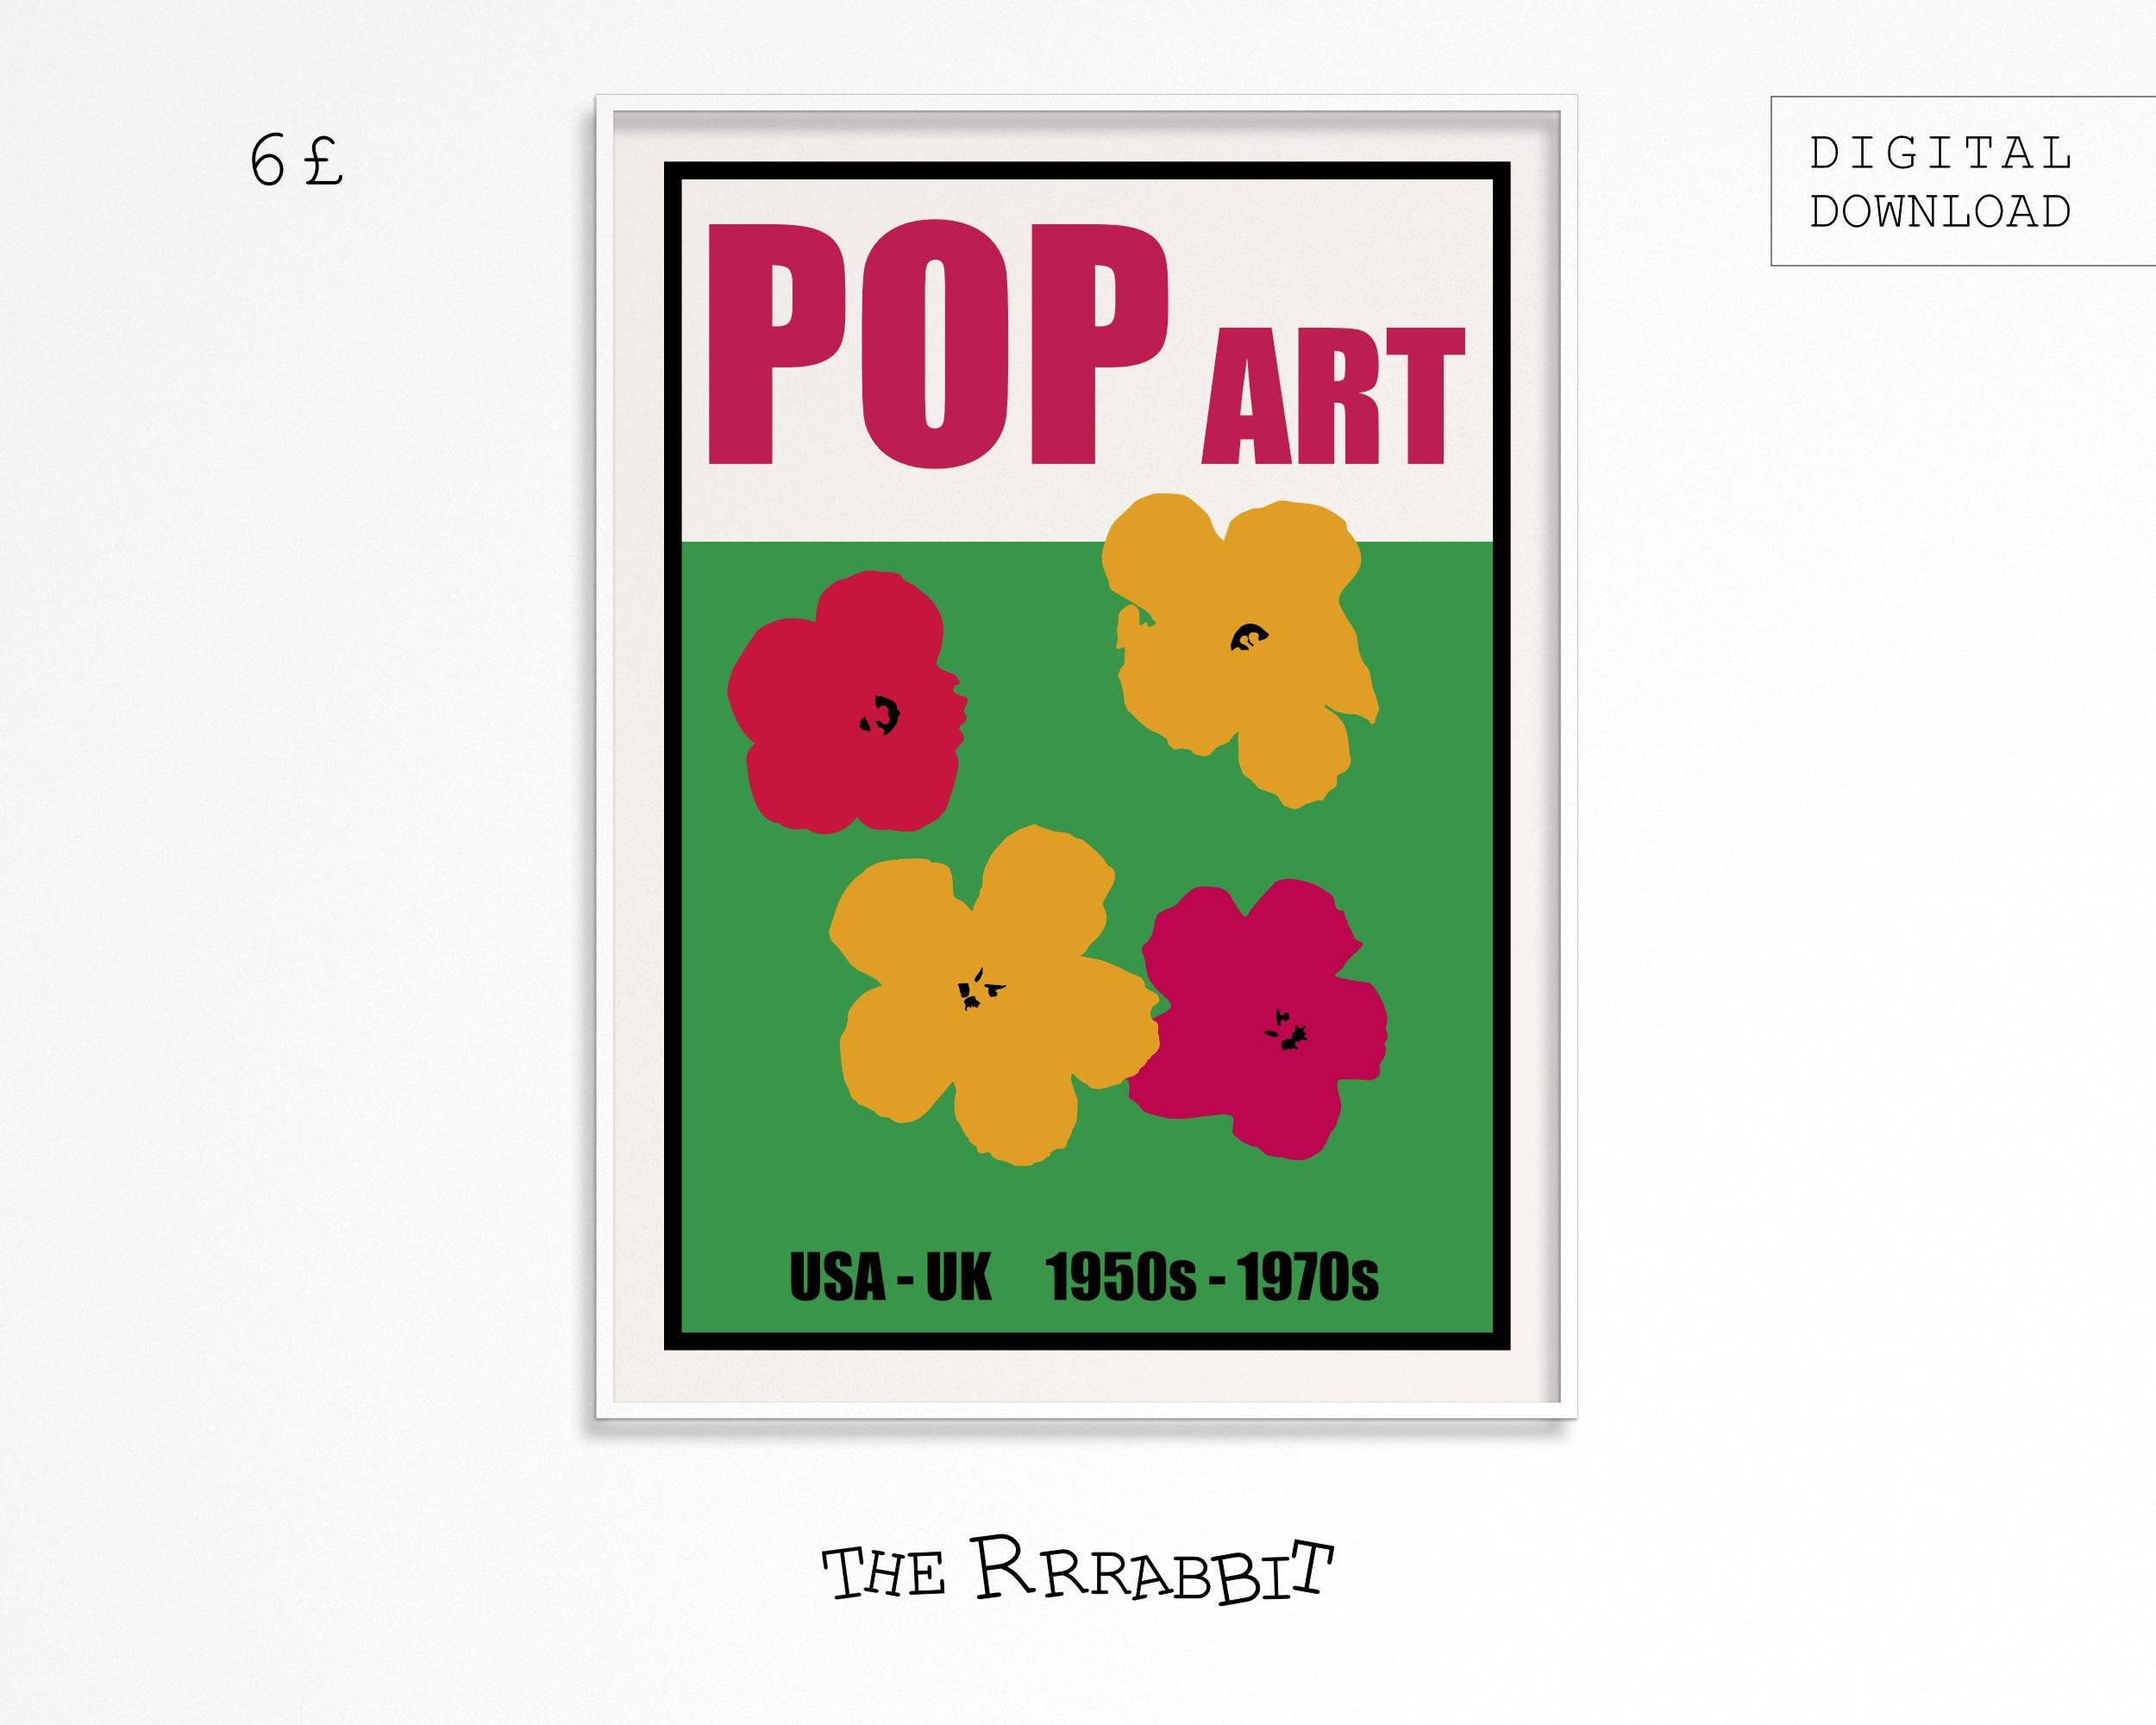 pop art downloadable poster